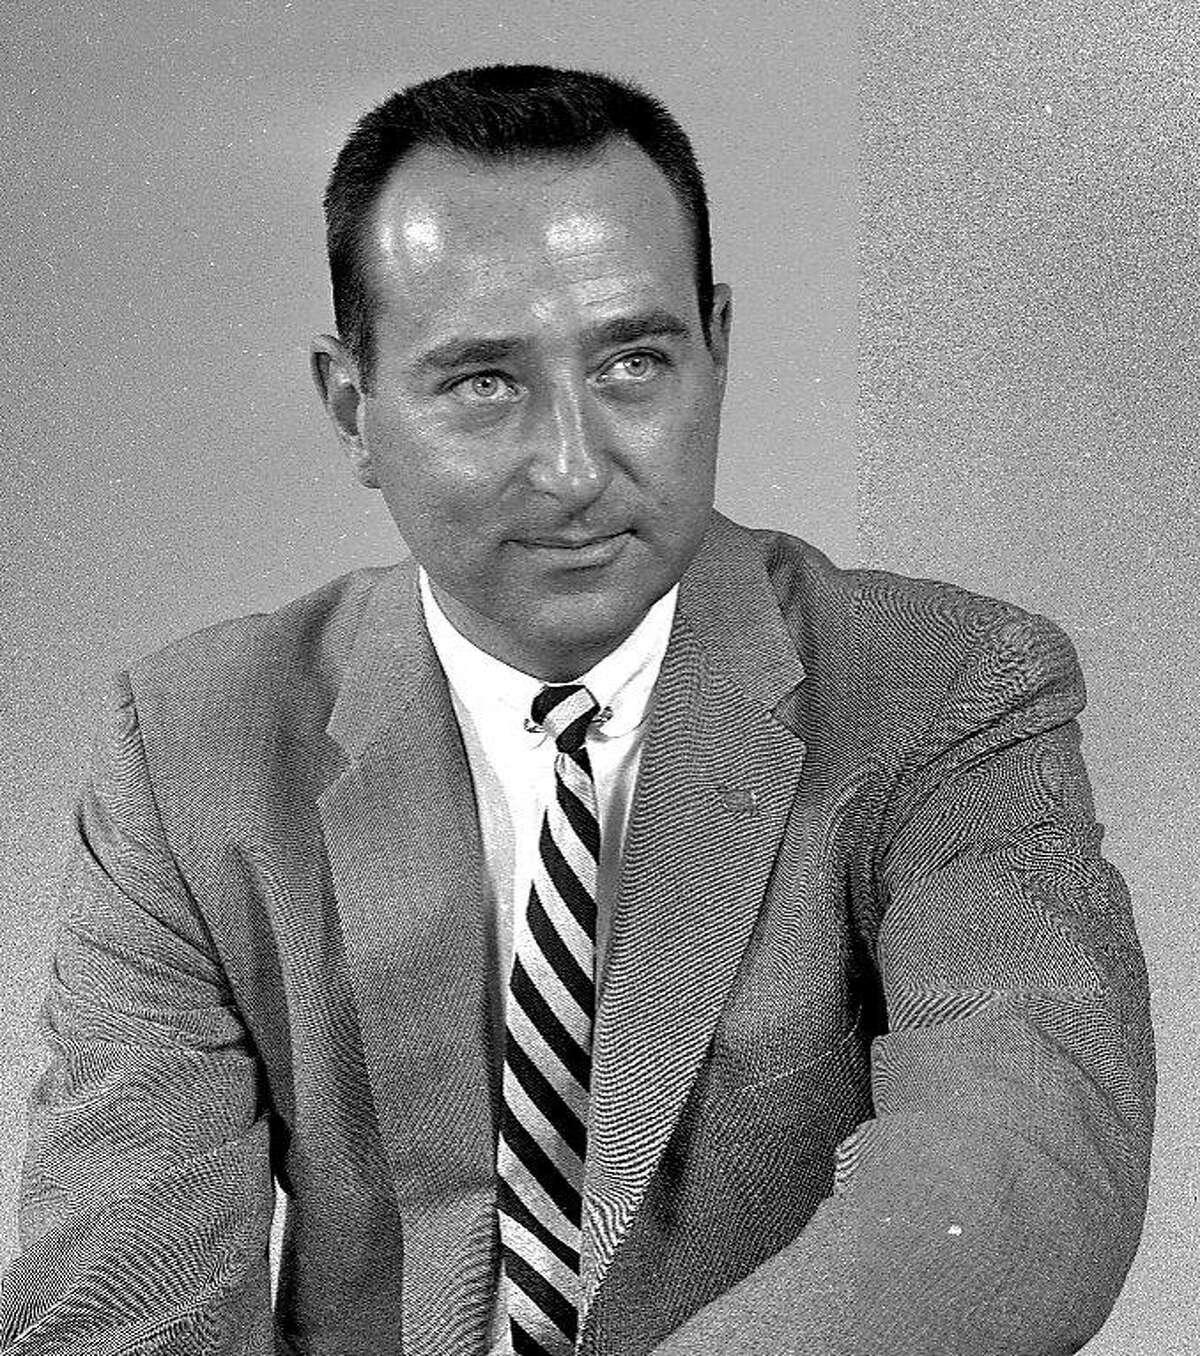 The late Dan Sorkin, longtime SF radio figure, in a 1958 photo.